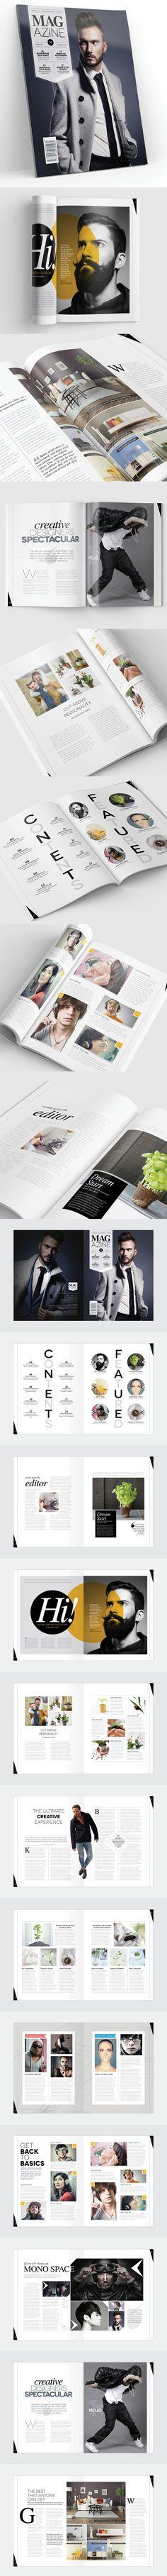 Echa un vistazo a este proyecto @Behance: \u201cMagazine Template - InDesign 24 Page Layout V12\u201d https://www.behance.net/gallery/54455637/Magazine-Template-InDesign-24-Page-Layout-V12